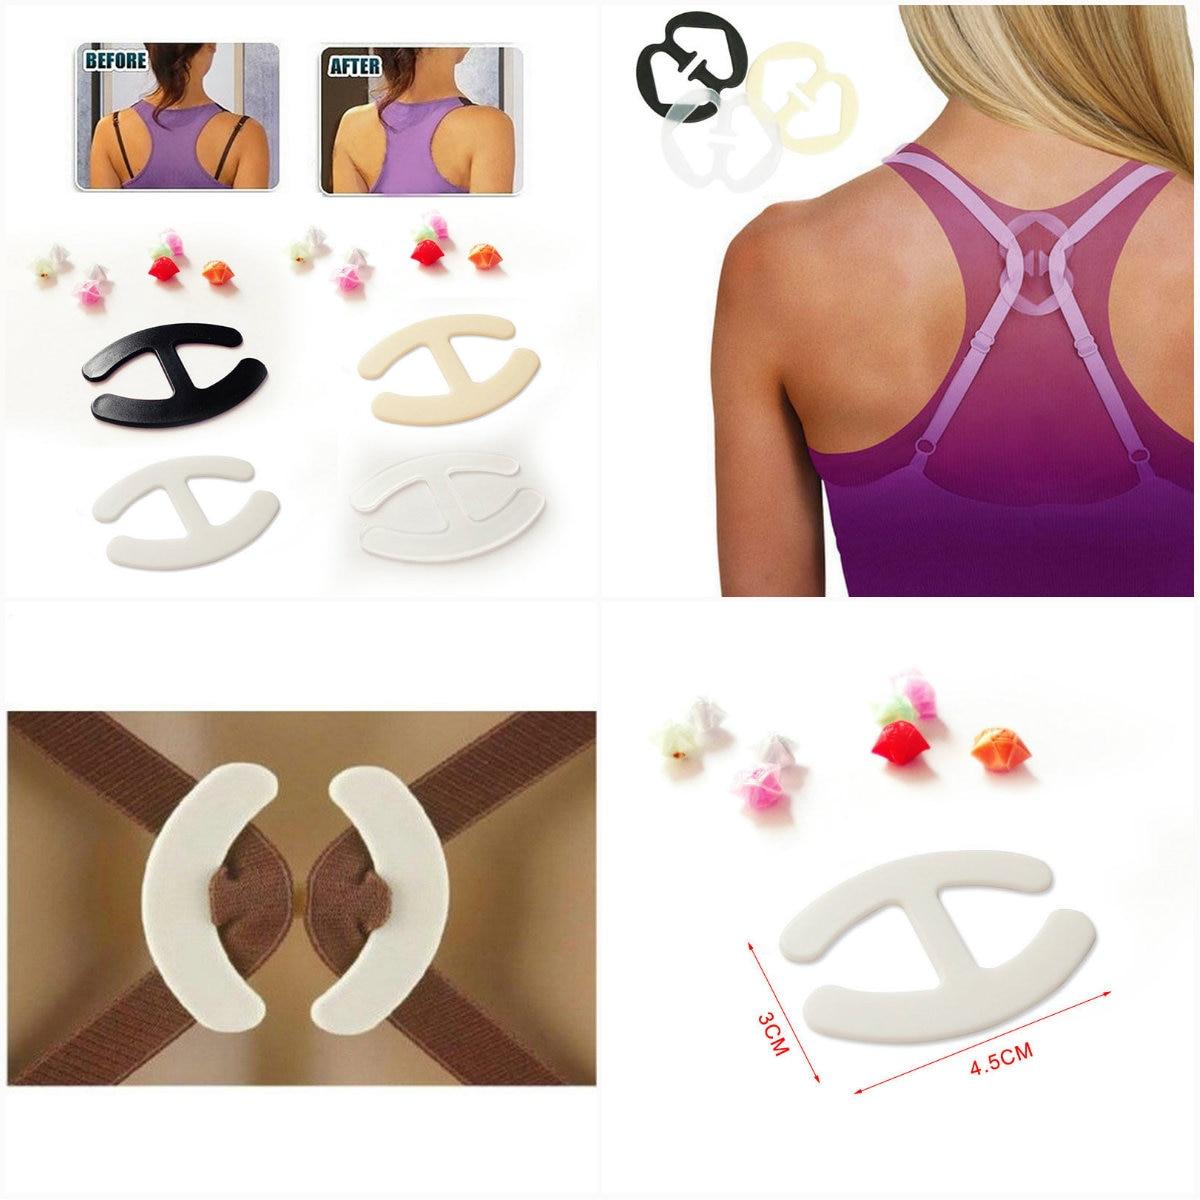 3pcs/lot H-shaped Clips Hide Converter Women's Push Up Cleavage Control Invisible Bra Strap Belt Clip Buckle Non-slip Buckle